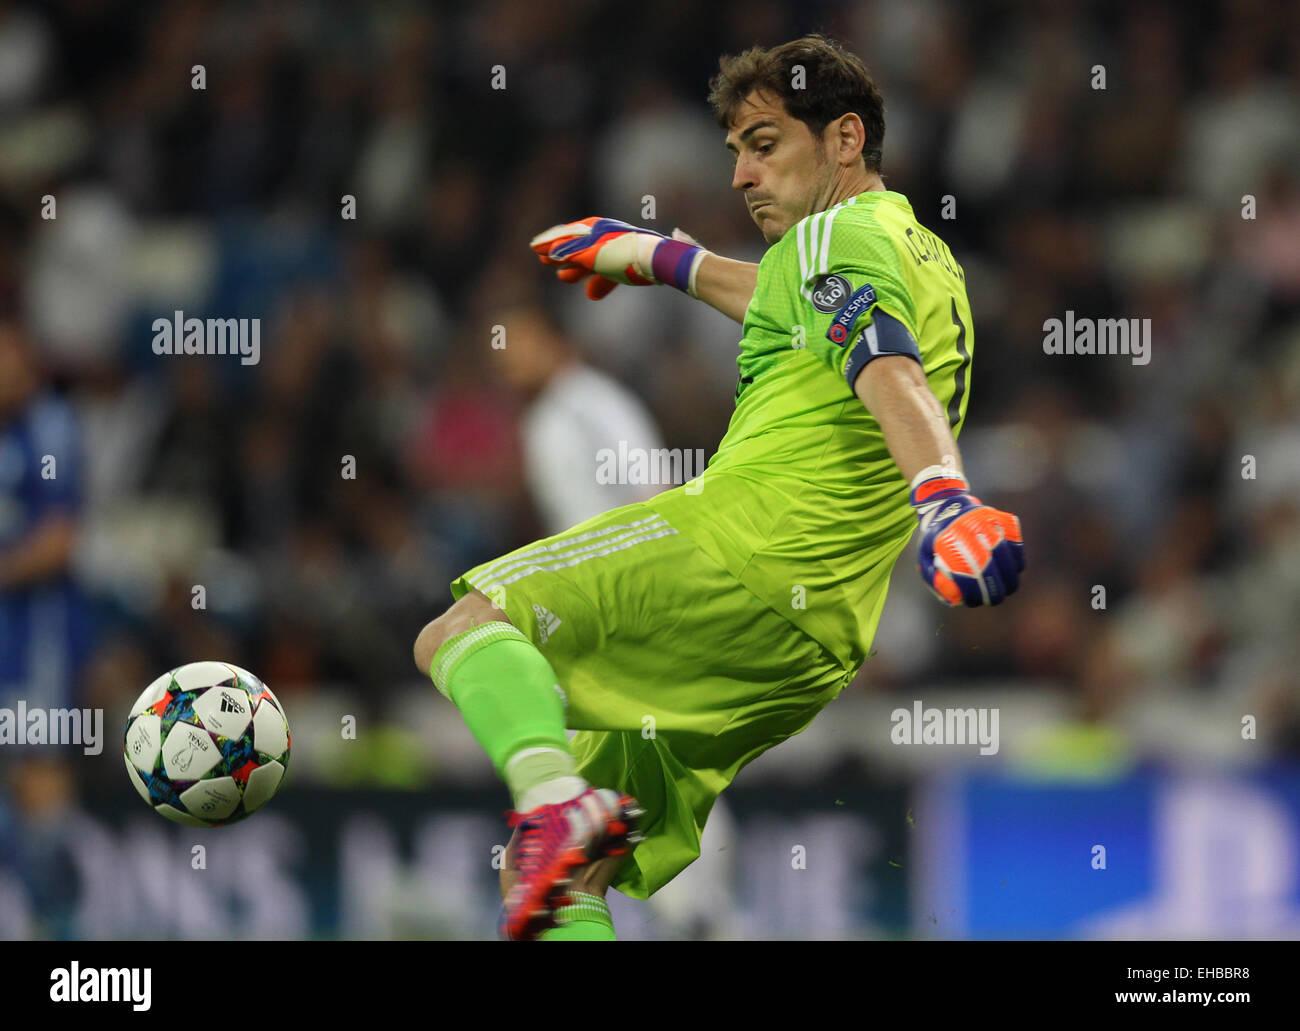 1a752f5f707 Casillas Spain Uefa Stock Photos   Casillas Spain Uefa Stock Images ...